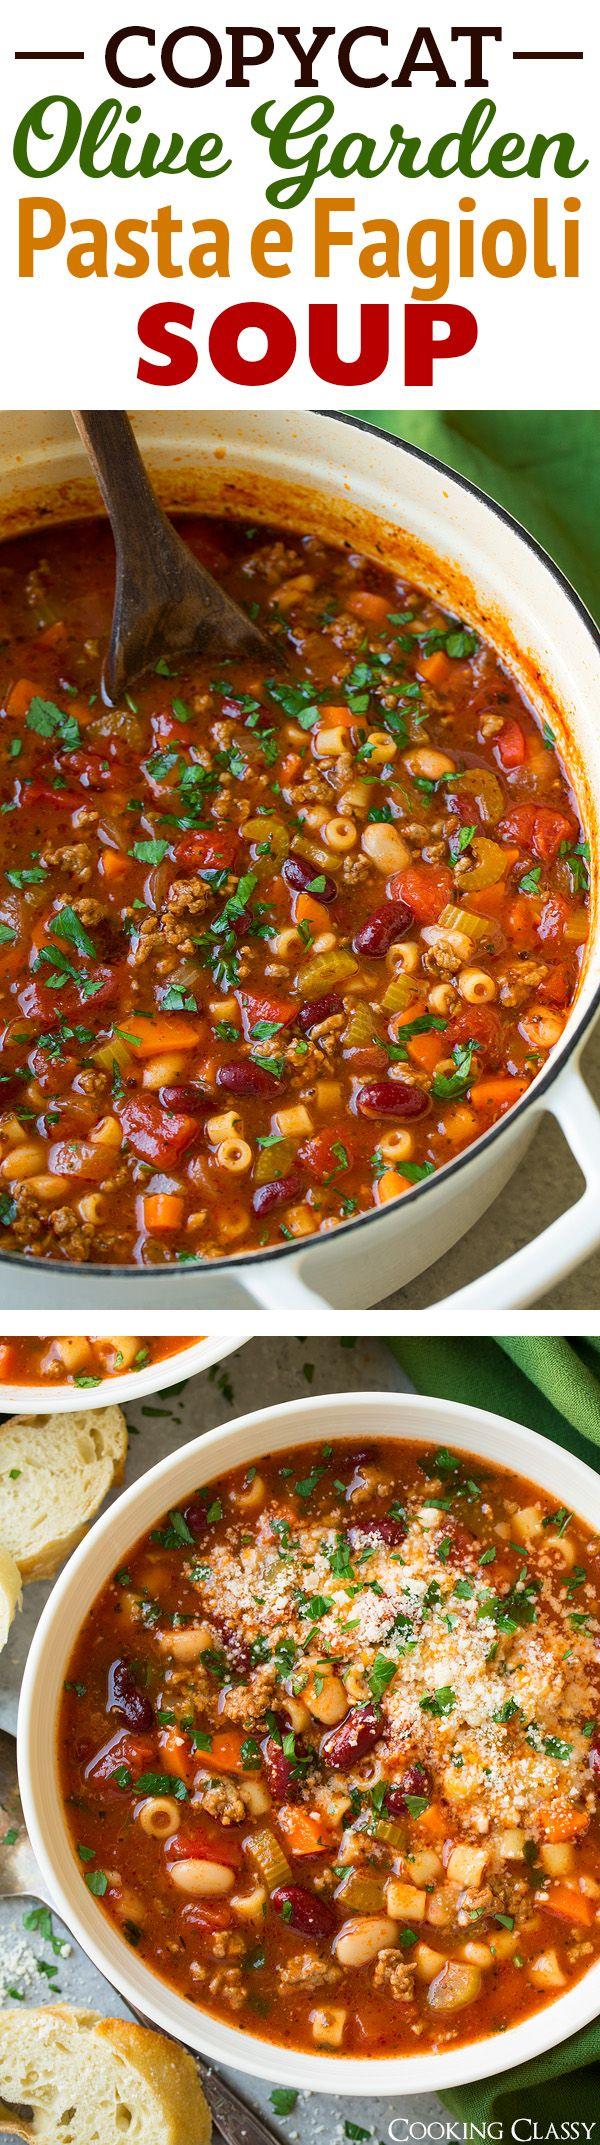 Olive Garden Pasta e Fagioli Soup Copycat Recipe - a family favorite ...